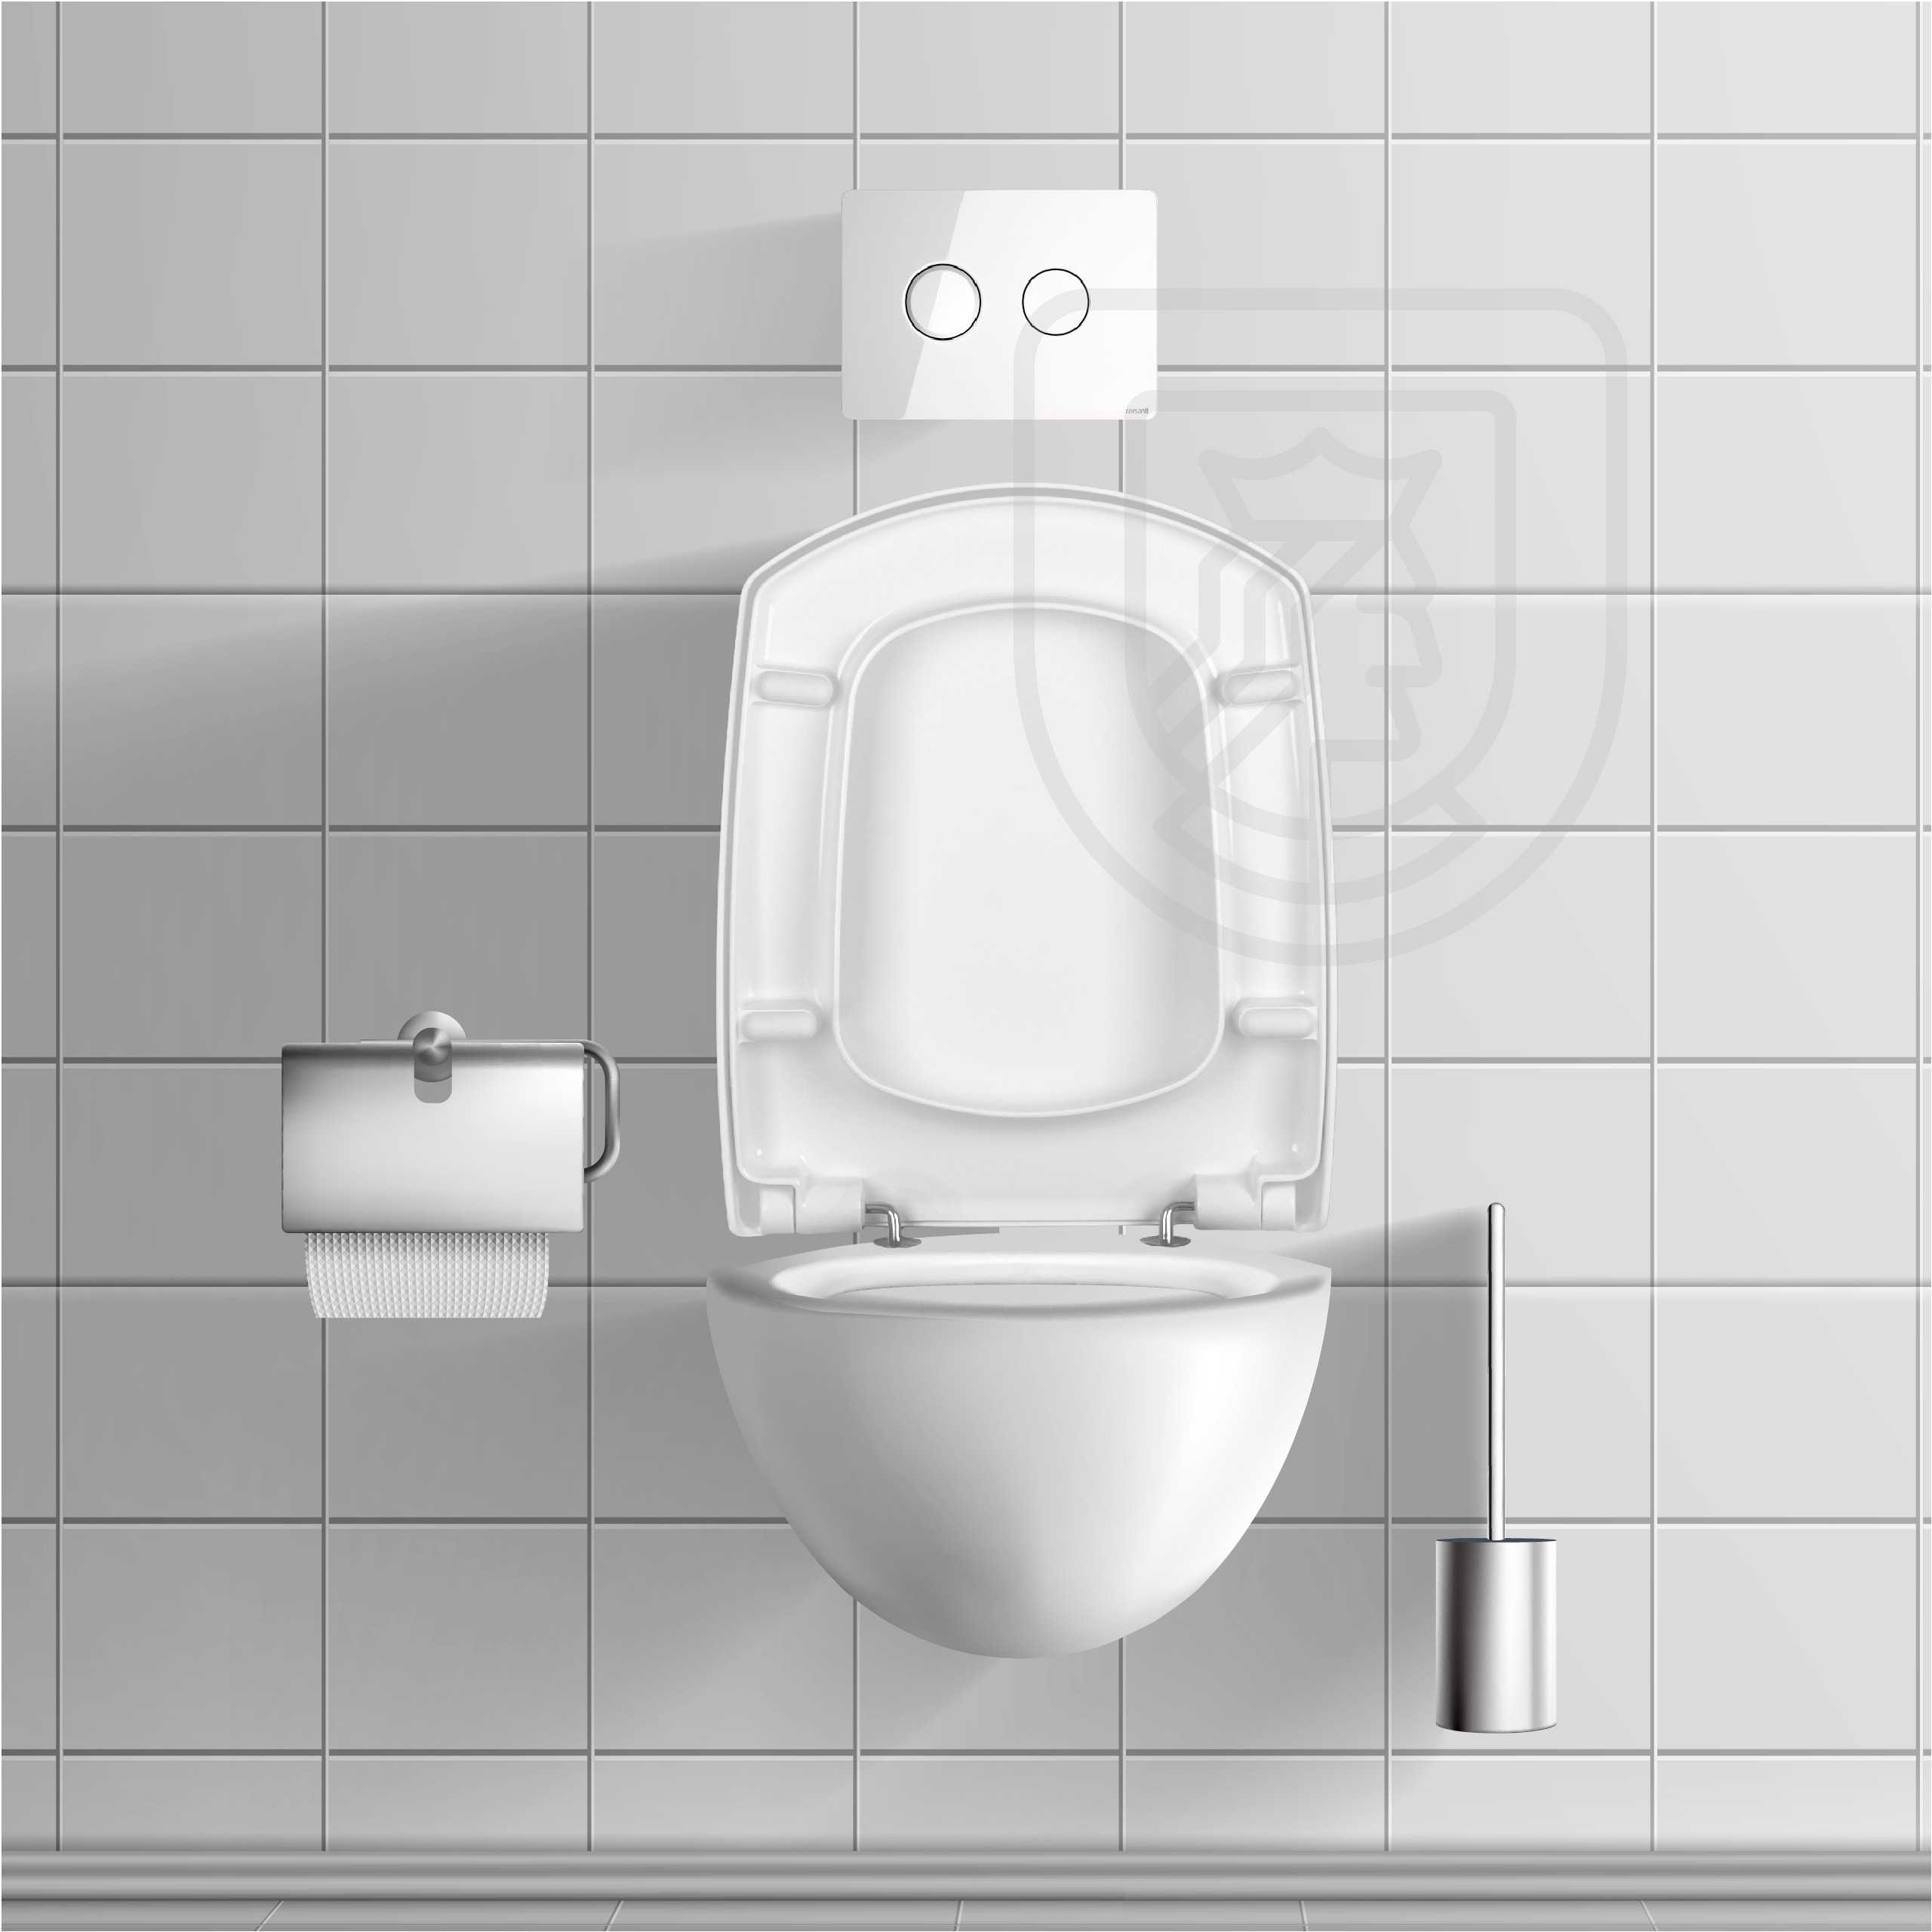 Deska sedesowa WC Carina do Cersanit